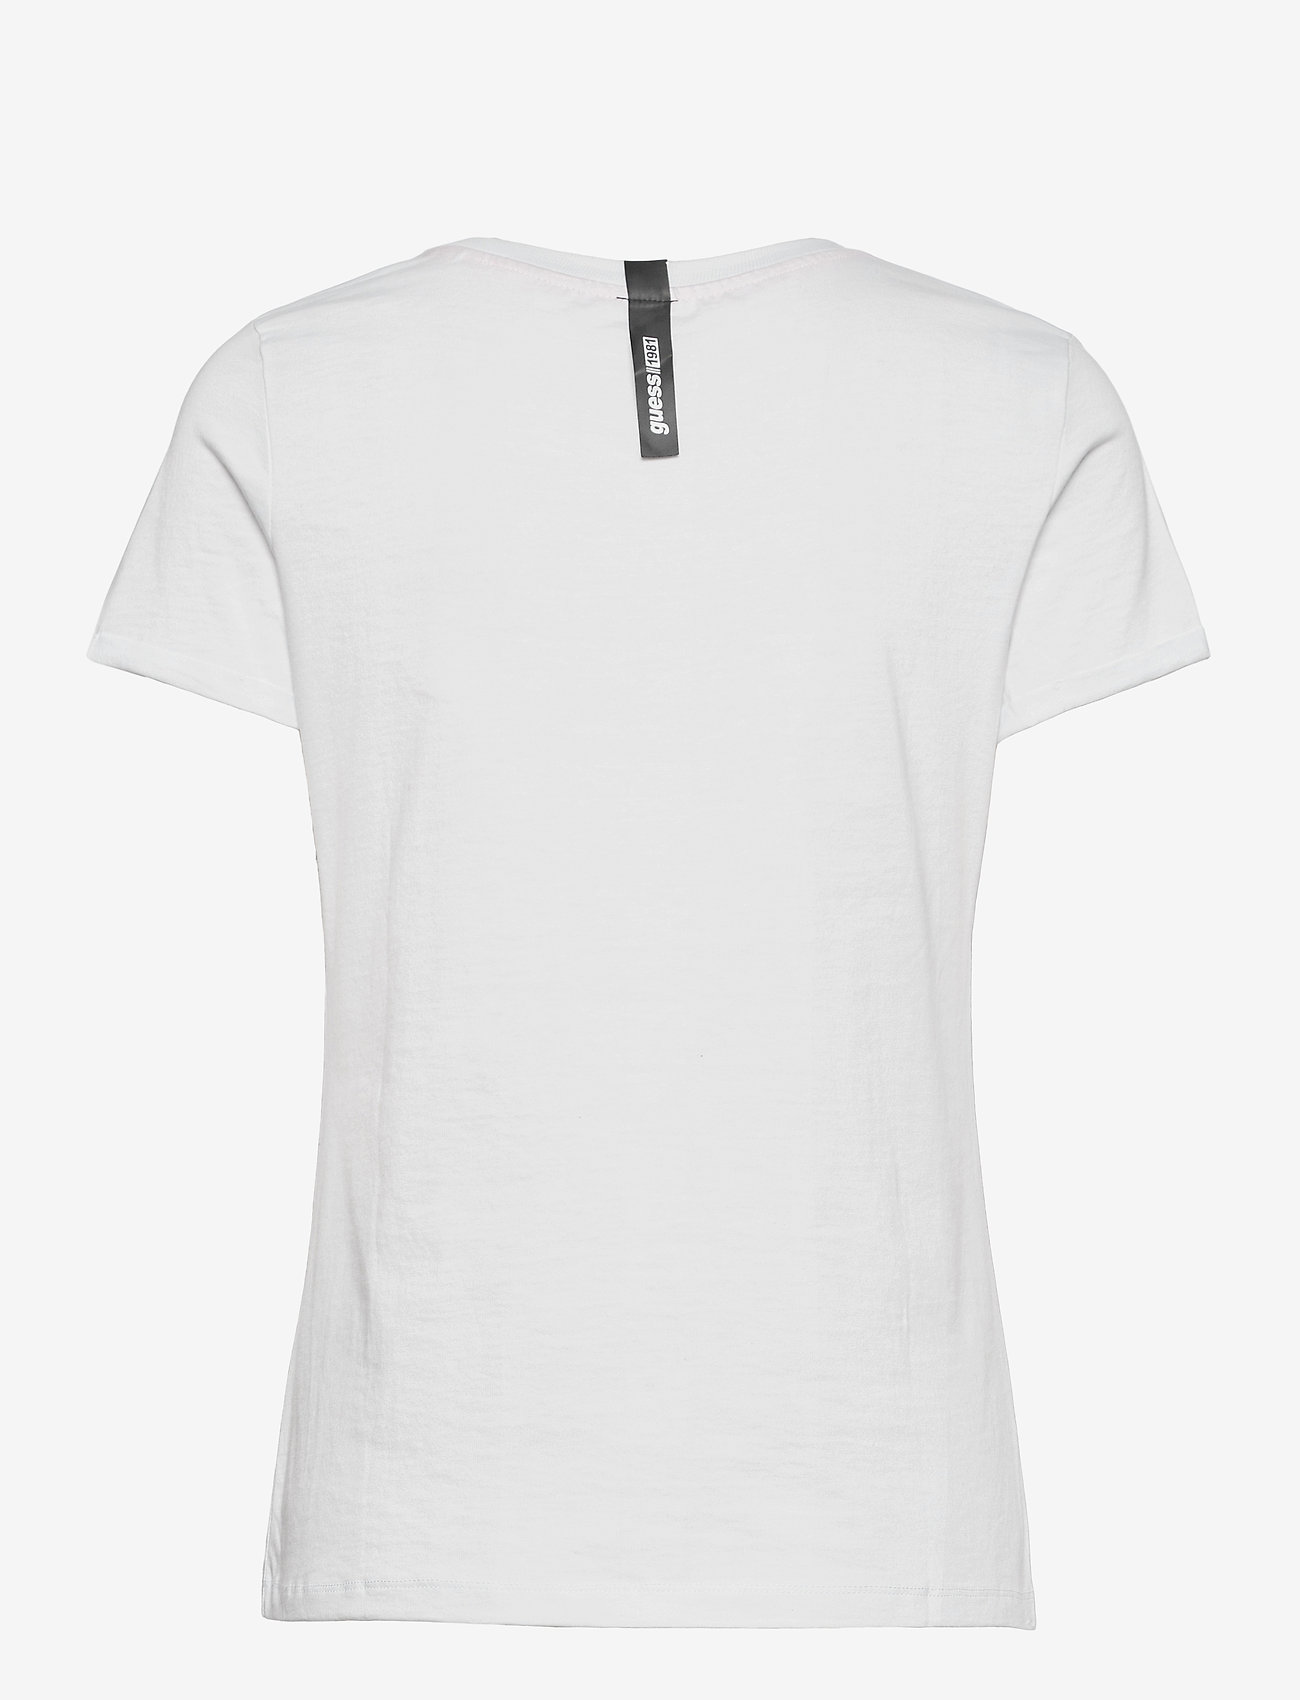 GUESS Jeans - SS CN MARGARITA TEE - t-shirts - true white a000 - 1